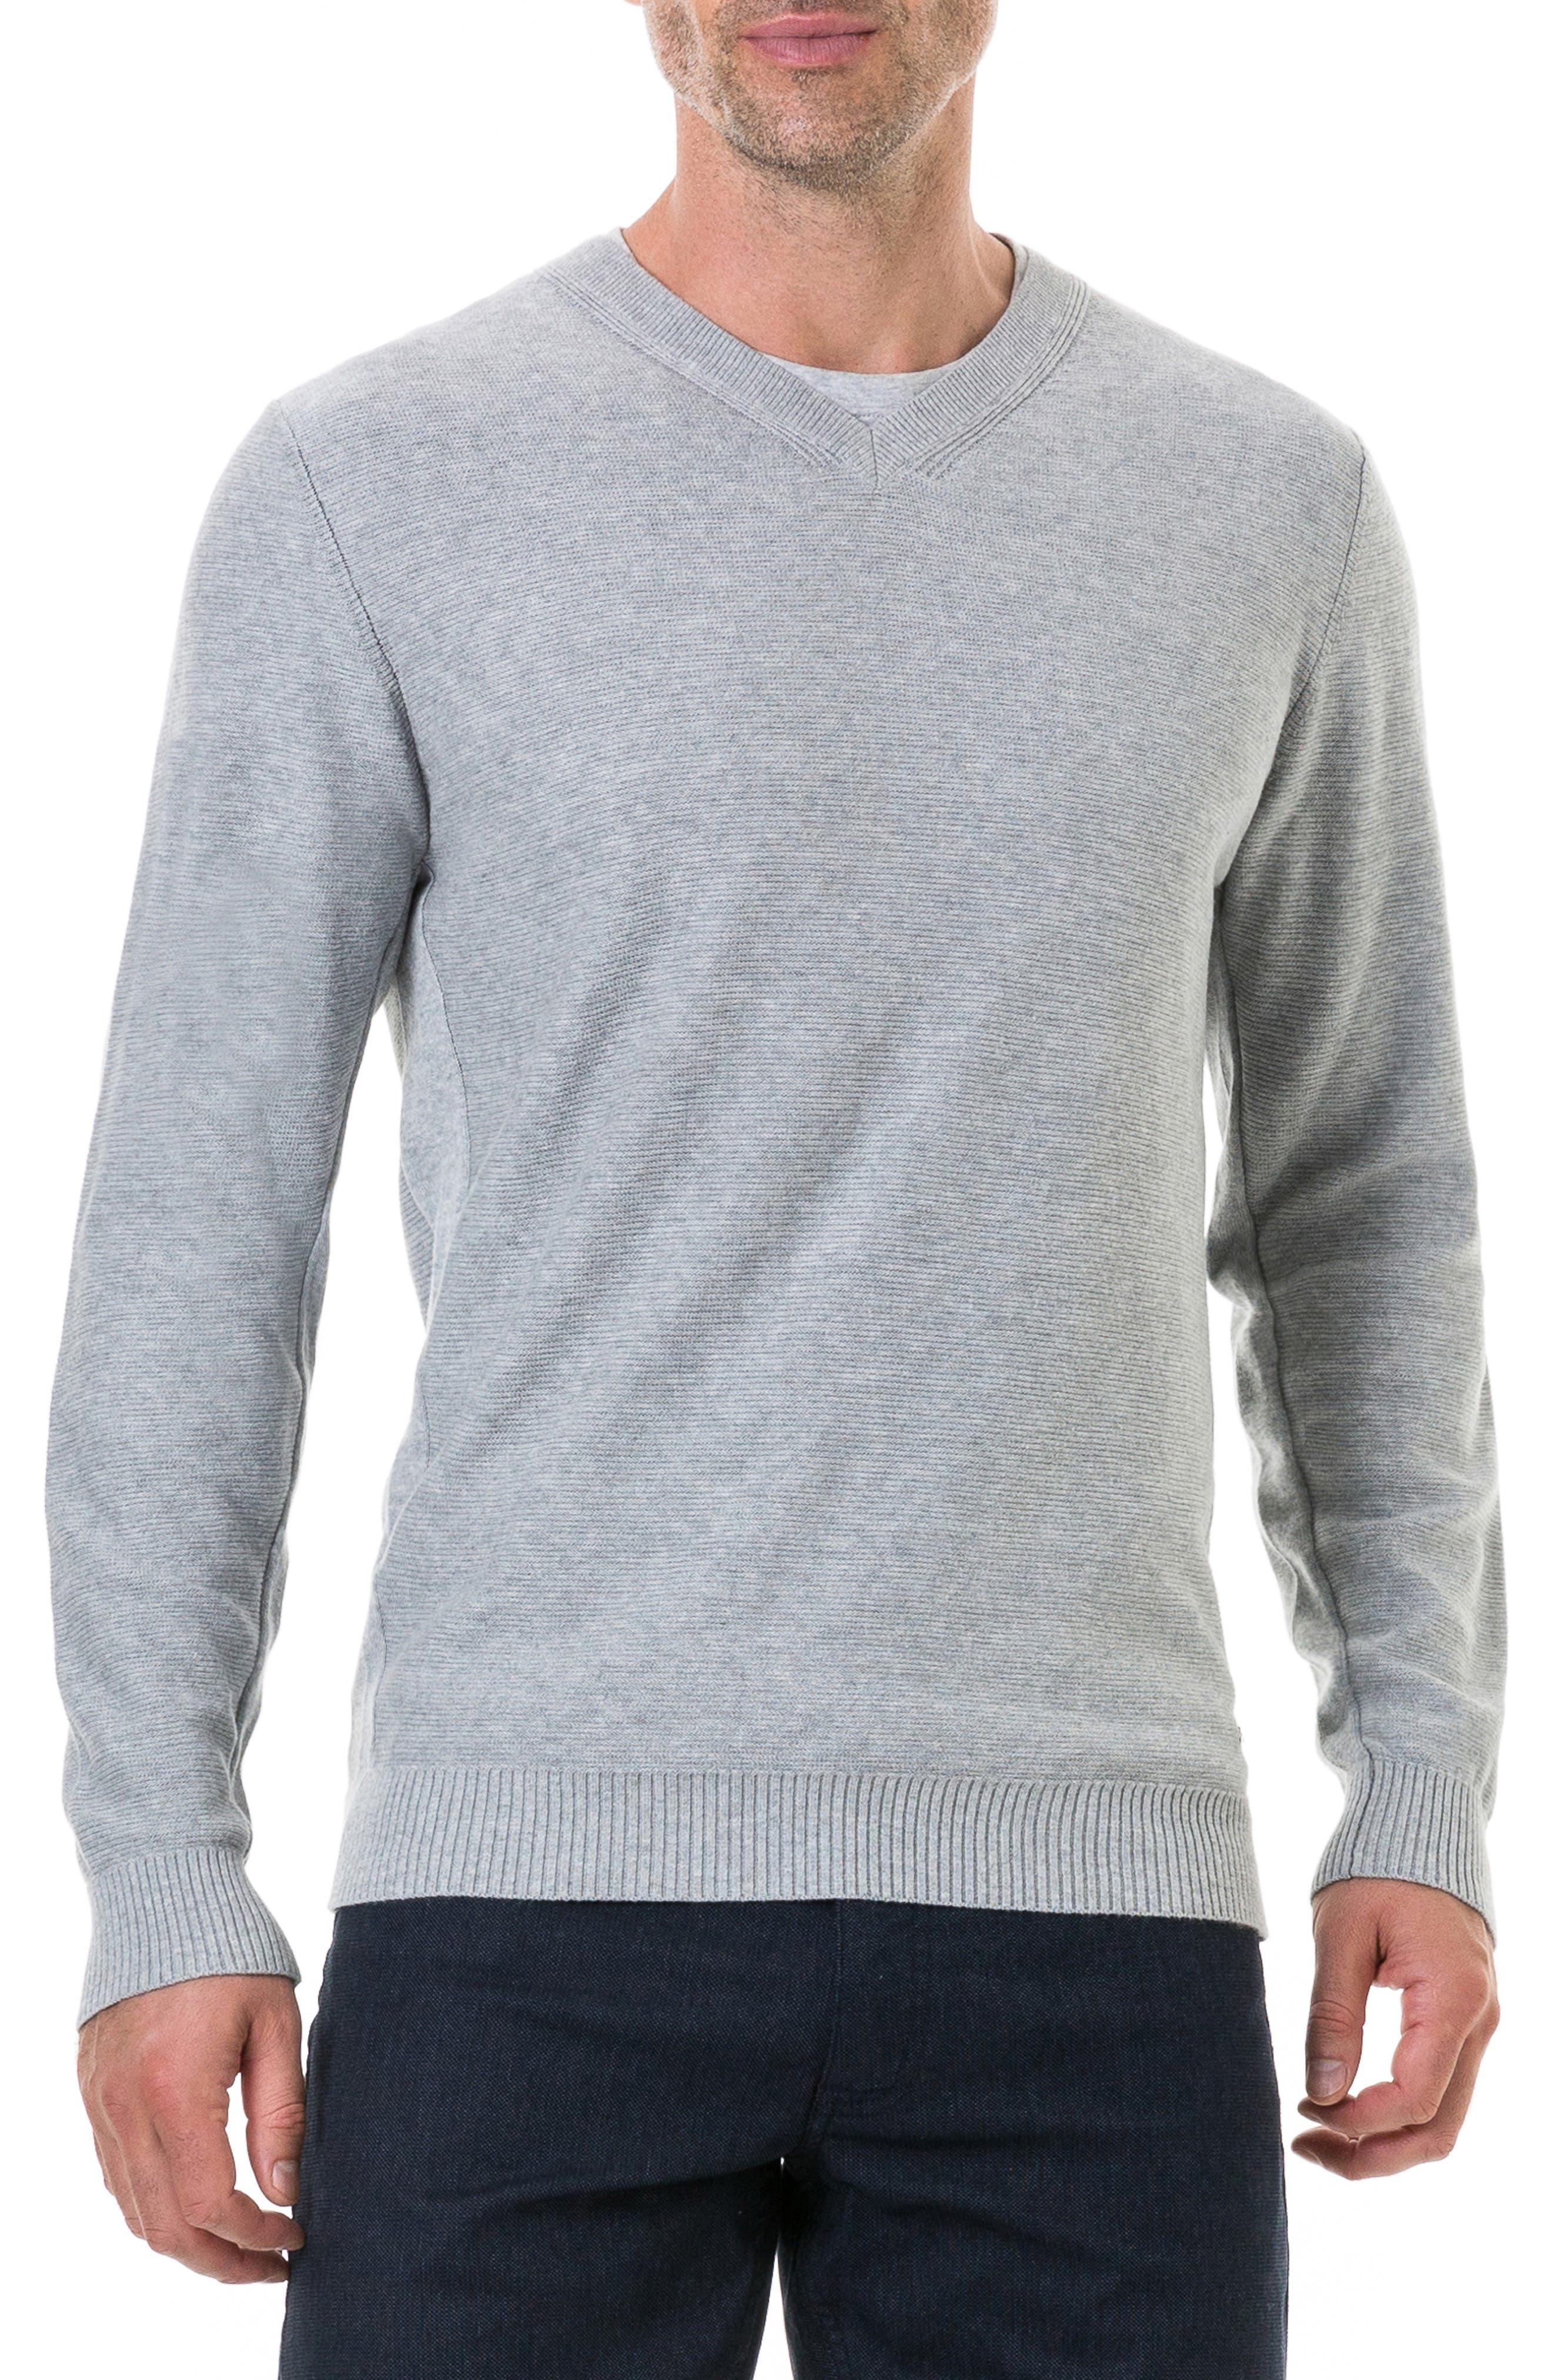 Ridgeview V-Neck Sweater,                             Main thumbnail 1, color,                             ASH